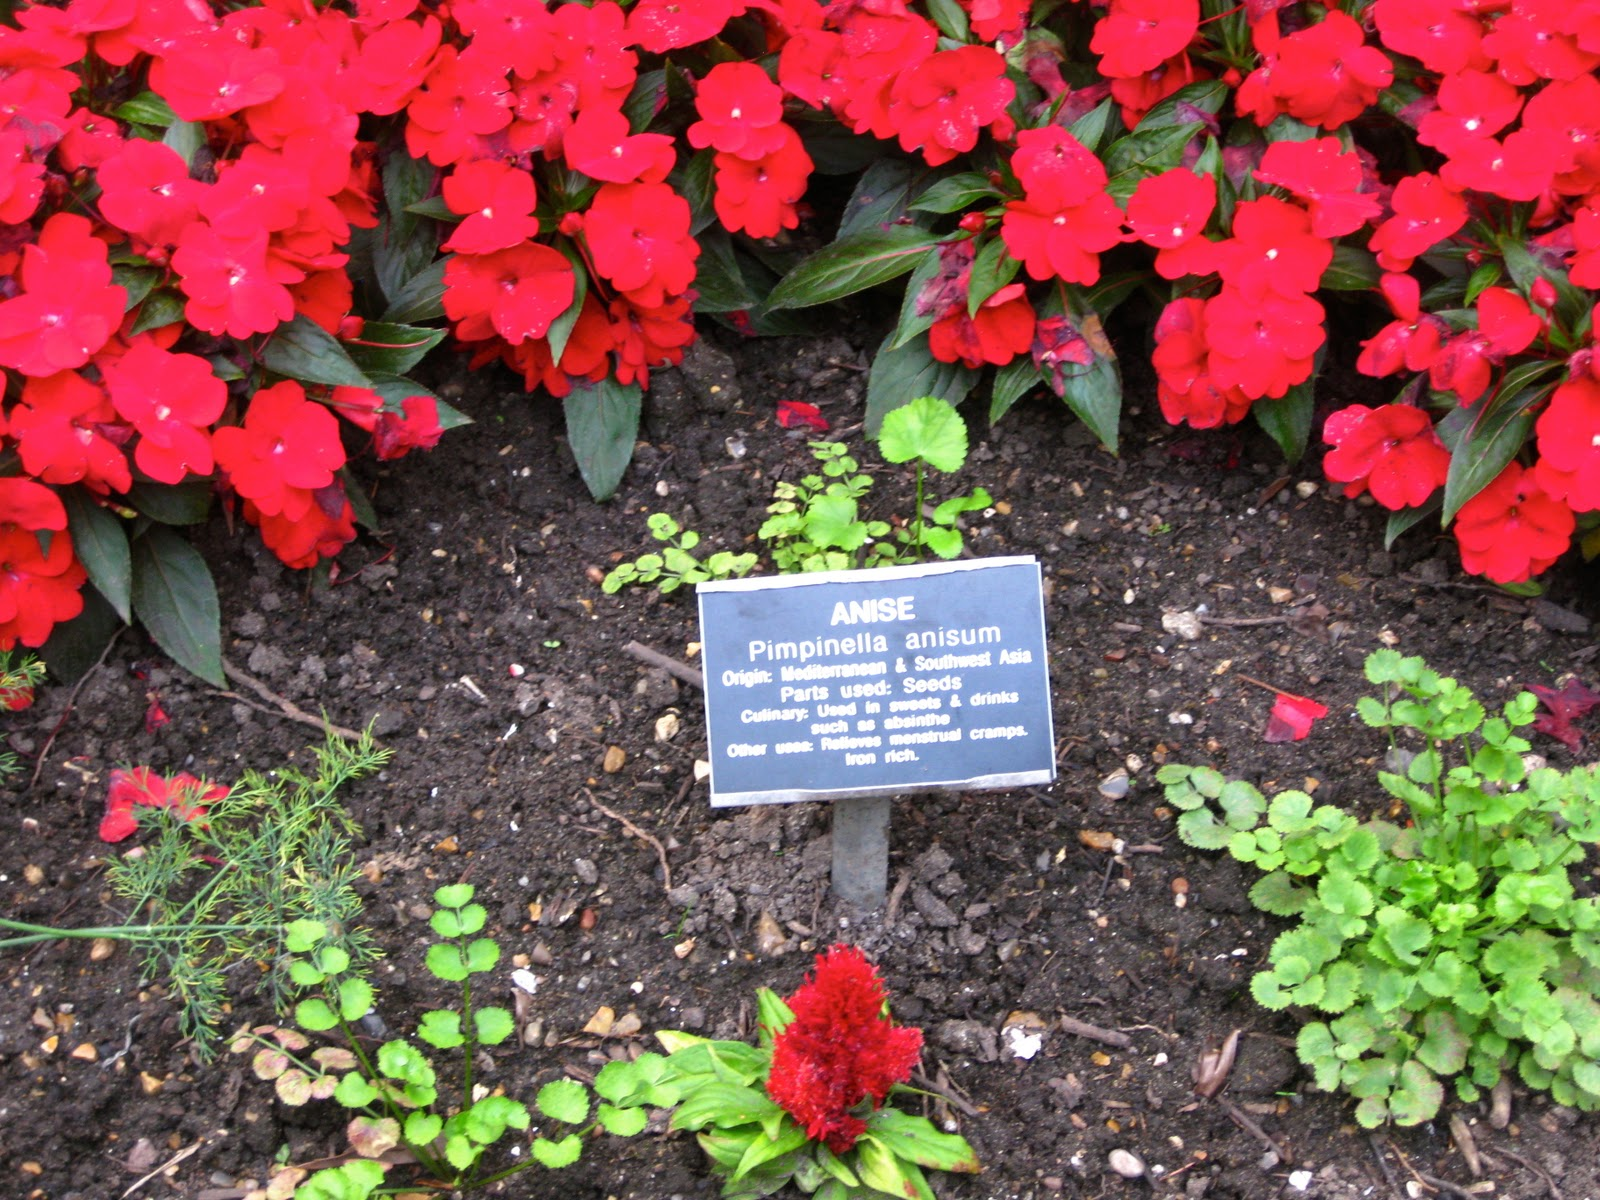 Physic garden wikipedia - Chelsea Physic Garden